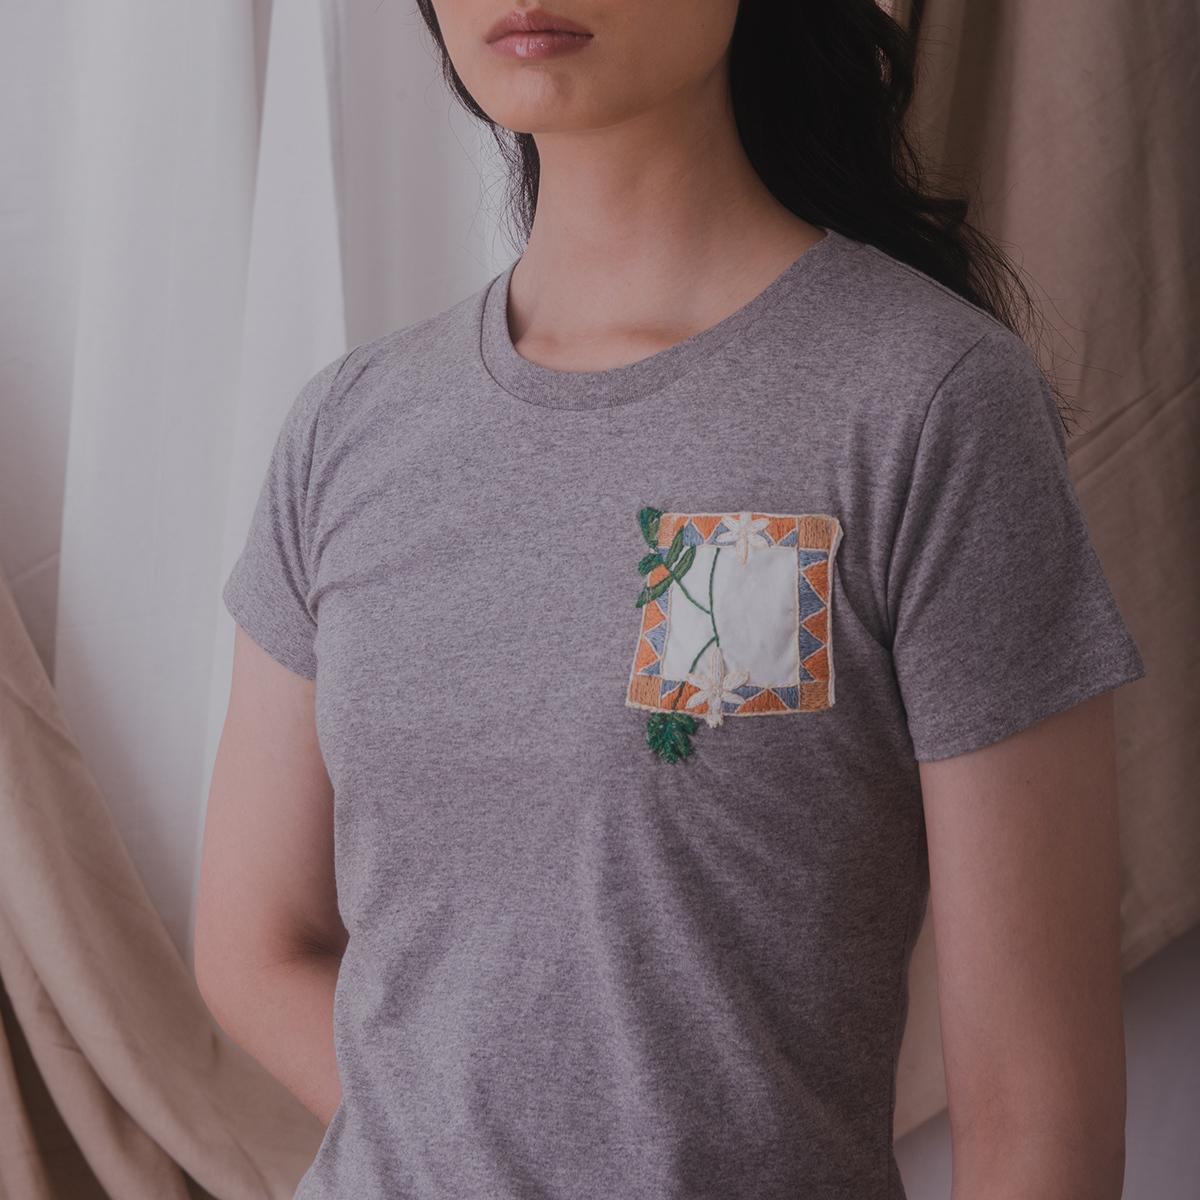 from Syria|來自敘利亞的手作禮物 | 挑禮物 YOUR GIFTS - 有機棉 / Organic Cotton